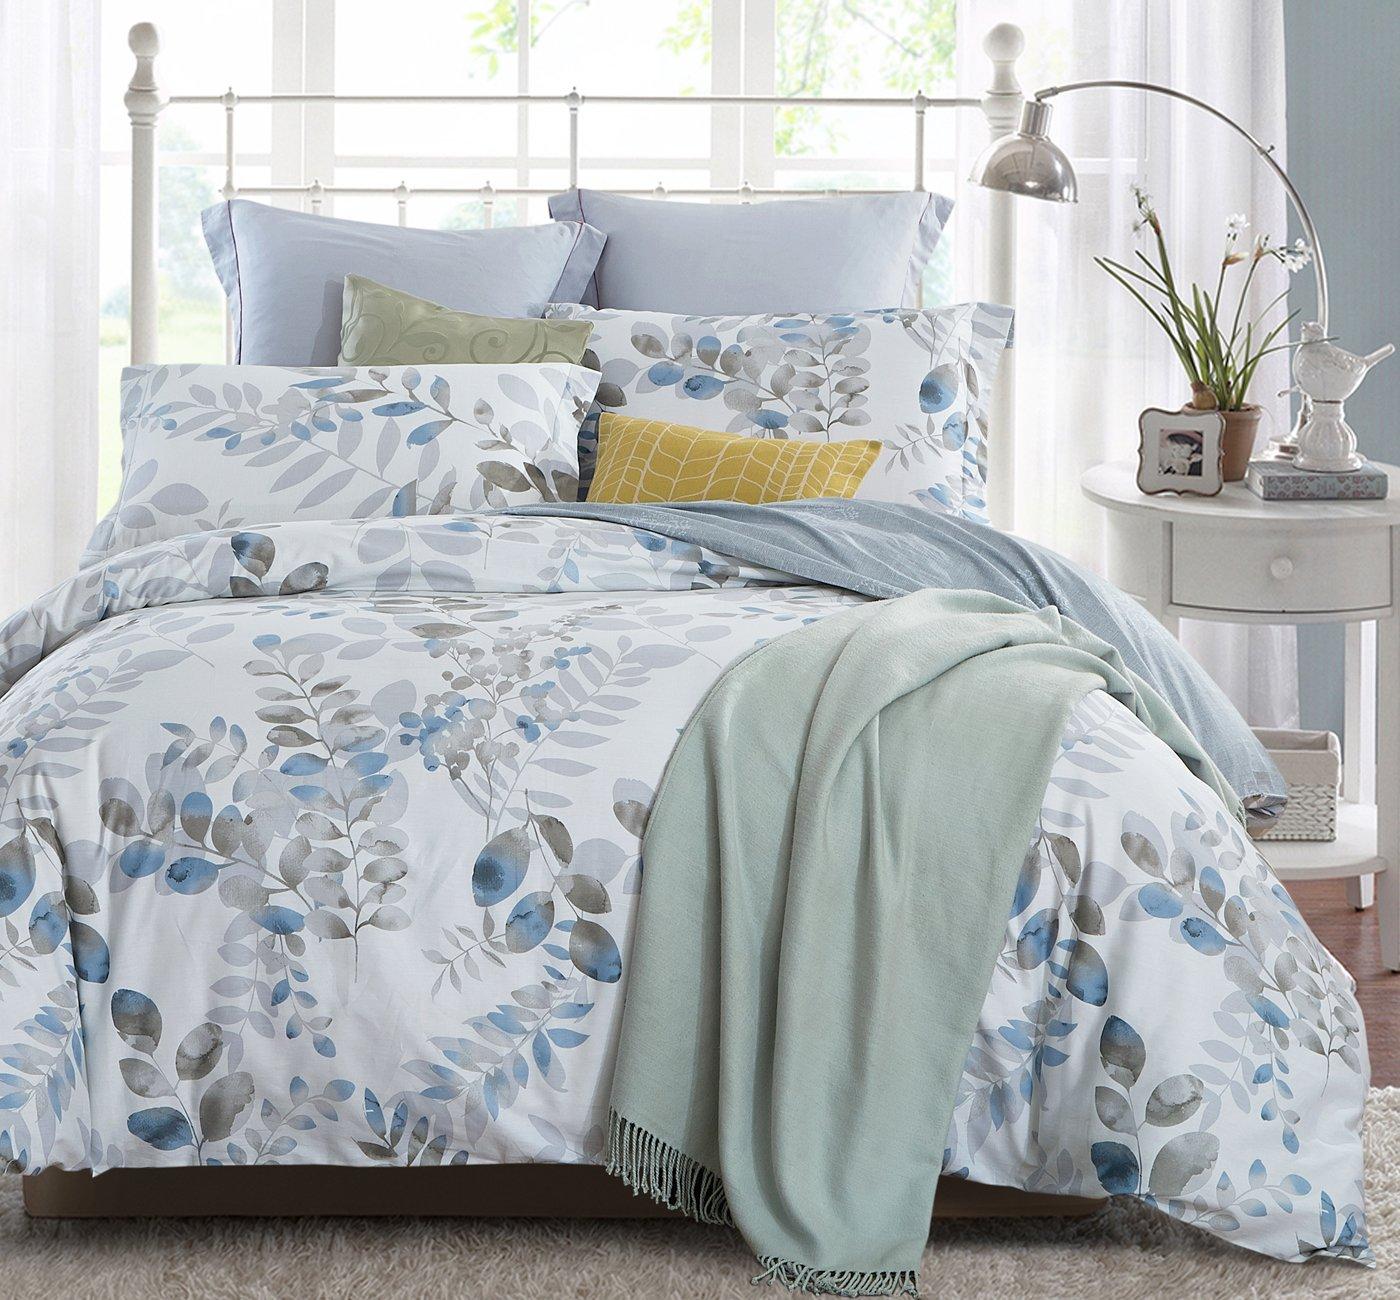 King COMIN16JU049423 Leaves Pattern Word of Dream 250TC 100/% Cotton Floral Print Duvet Cover Set 3 PC